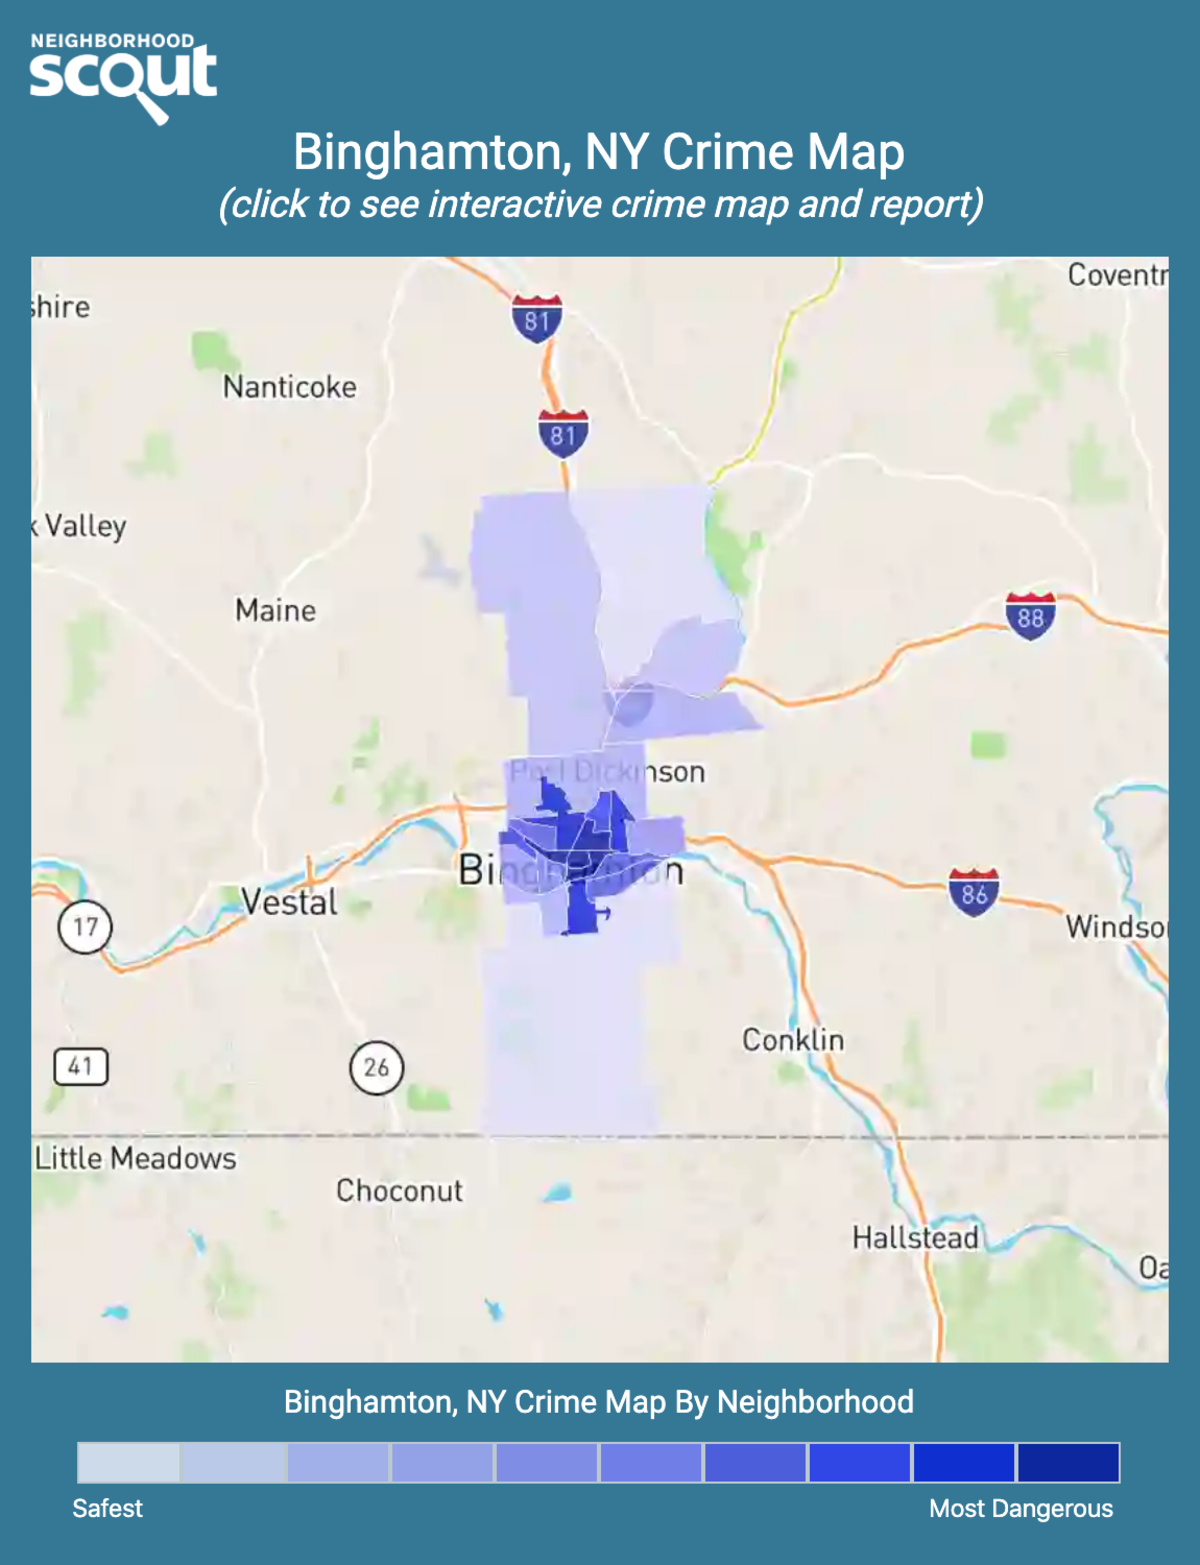 Binghamton, New York crime map